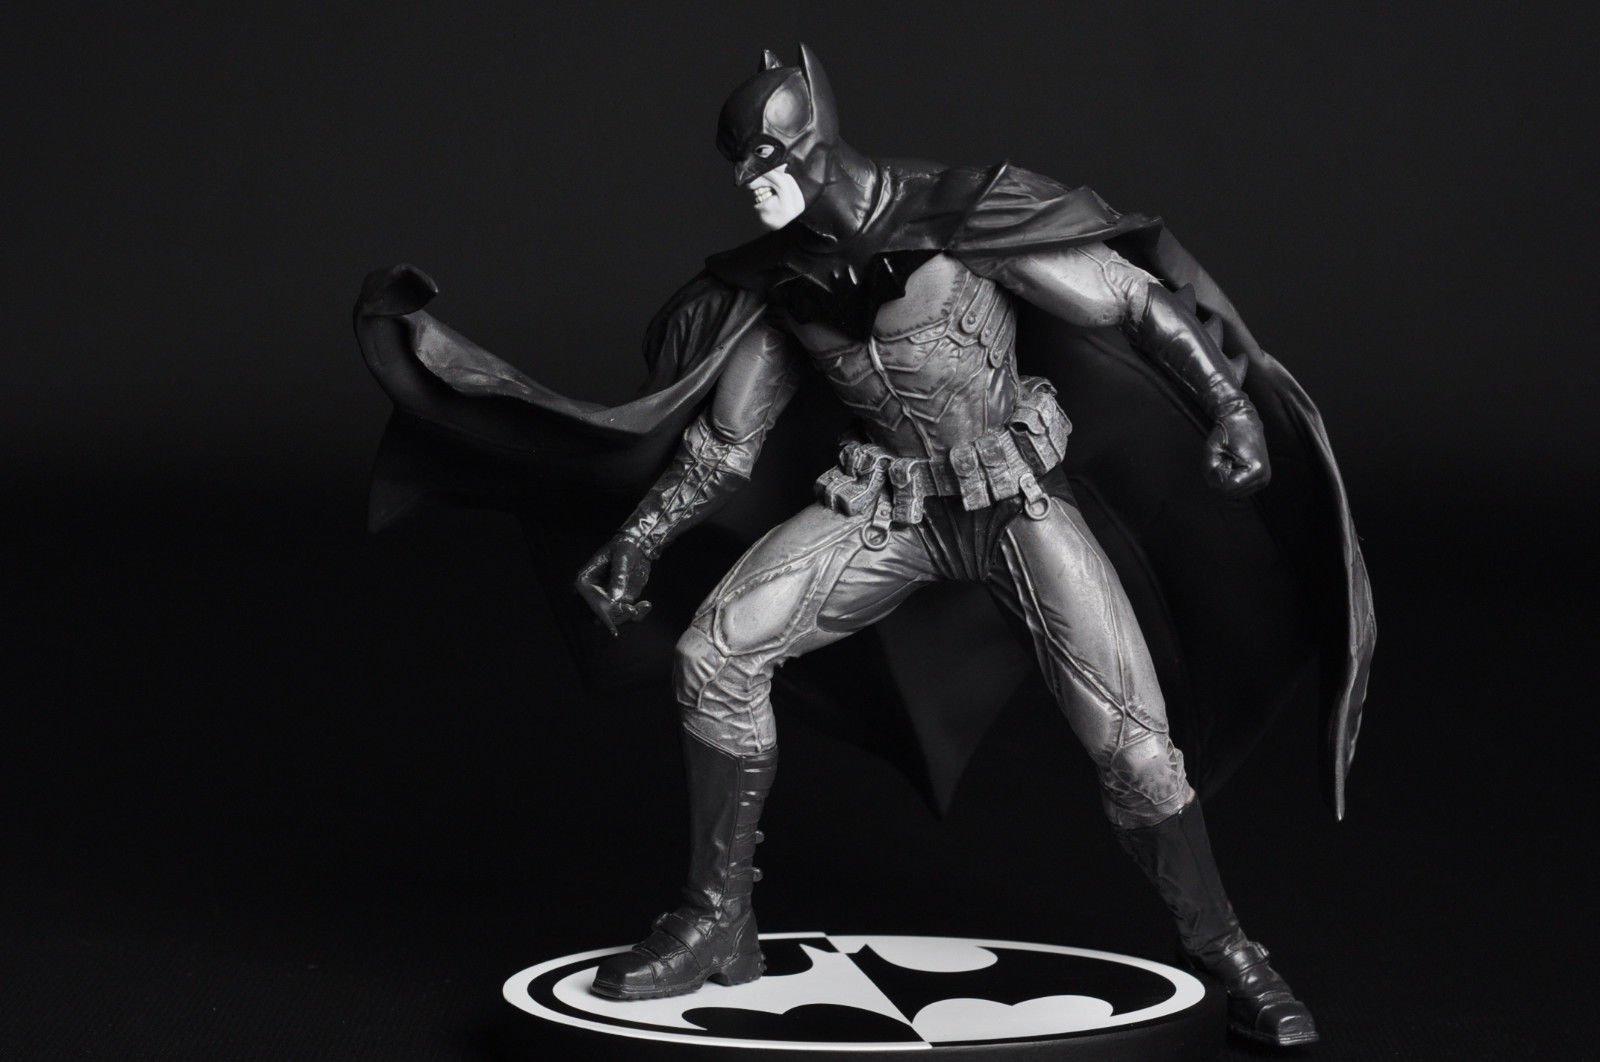 original (1) & Ben Afflecku0027s Batman Costume Inspired by Graphic Novel u0027Noelu0027?